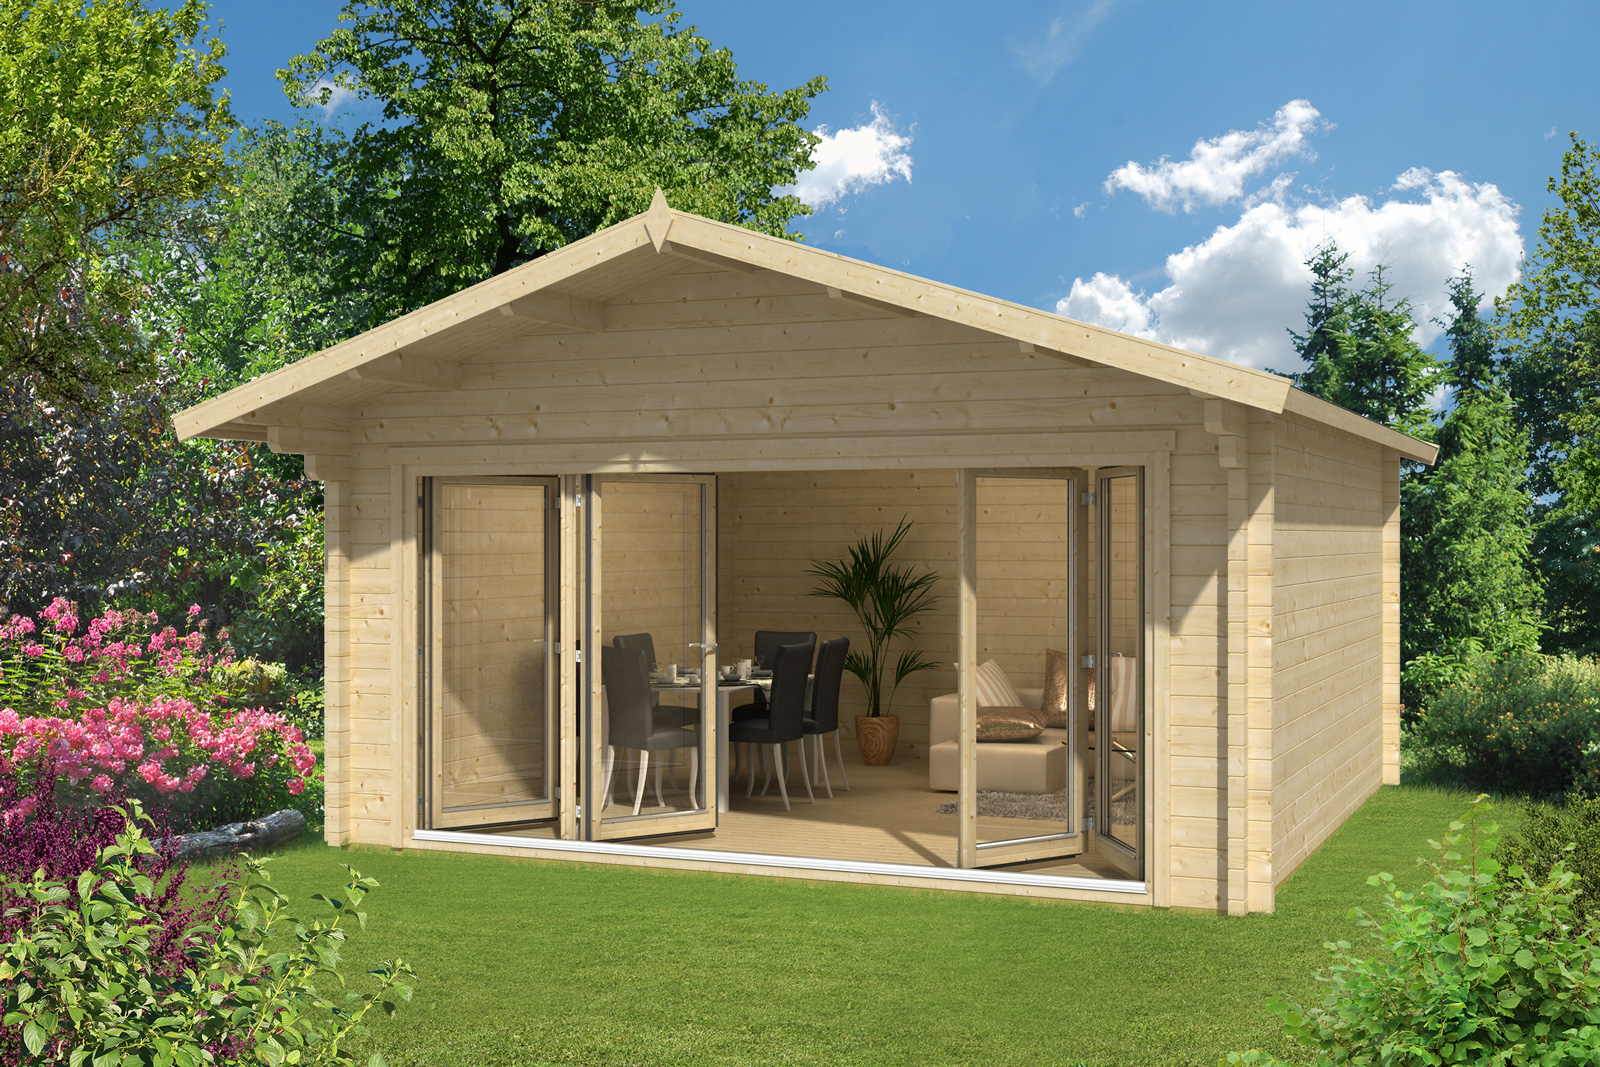 gartenhaus enzian 70 premium. Black Bedroom Furniture Sets. Home Design Ideas